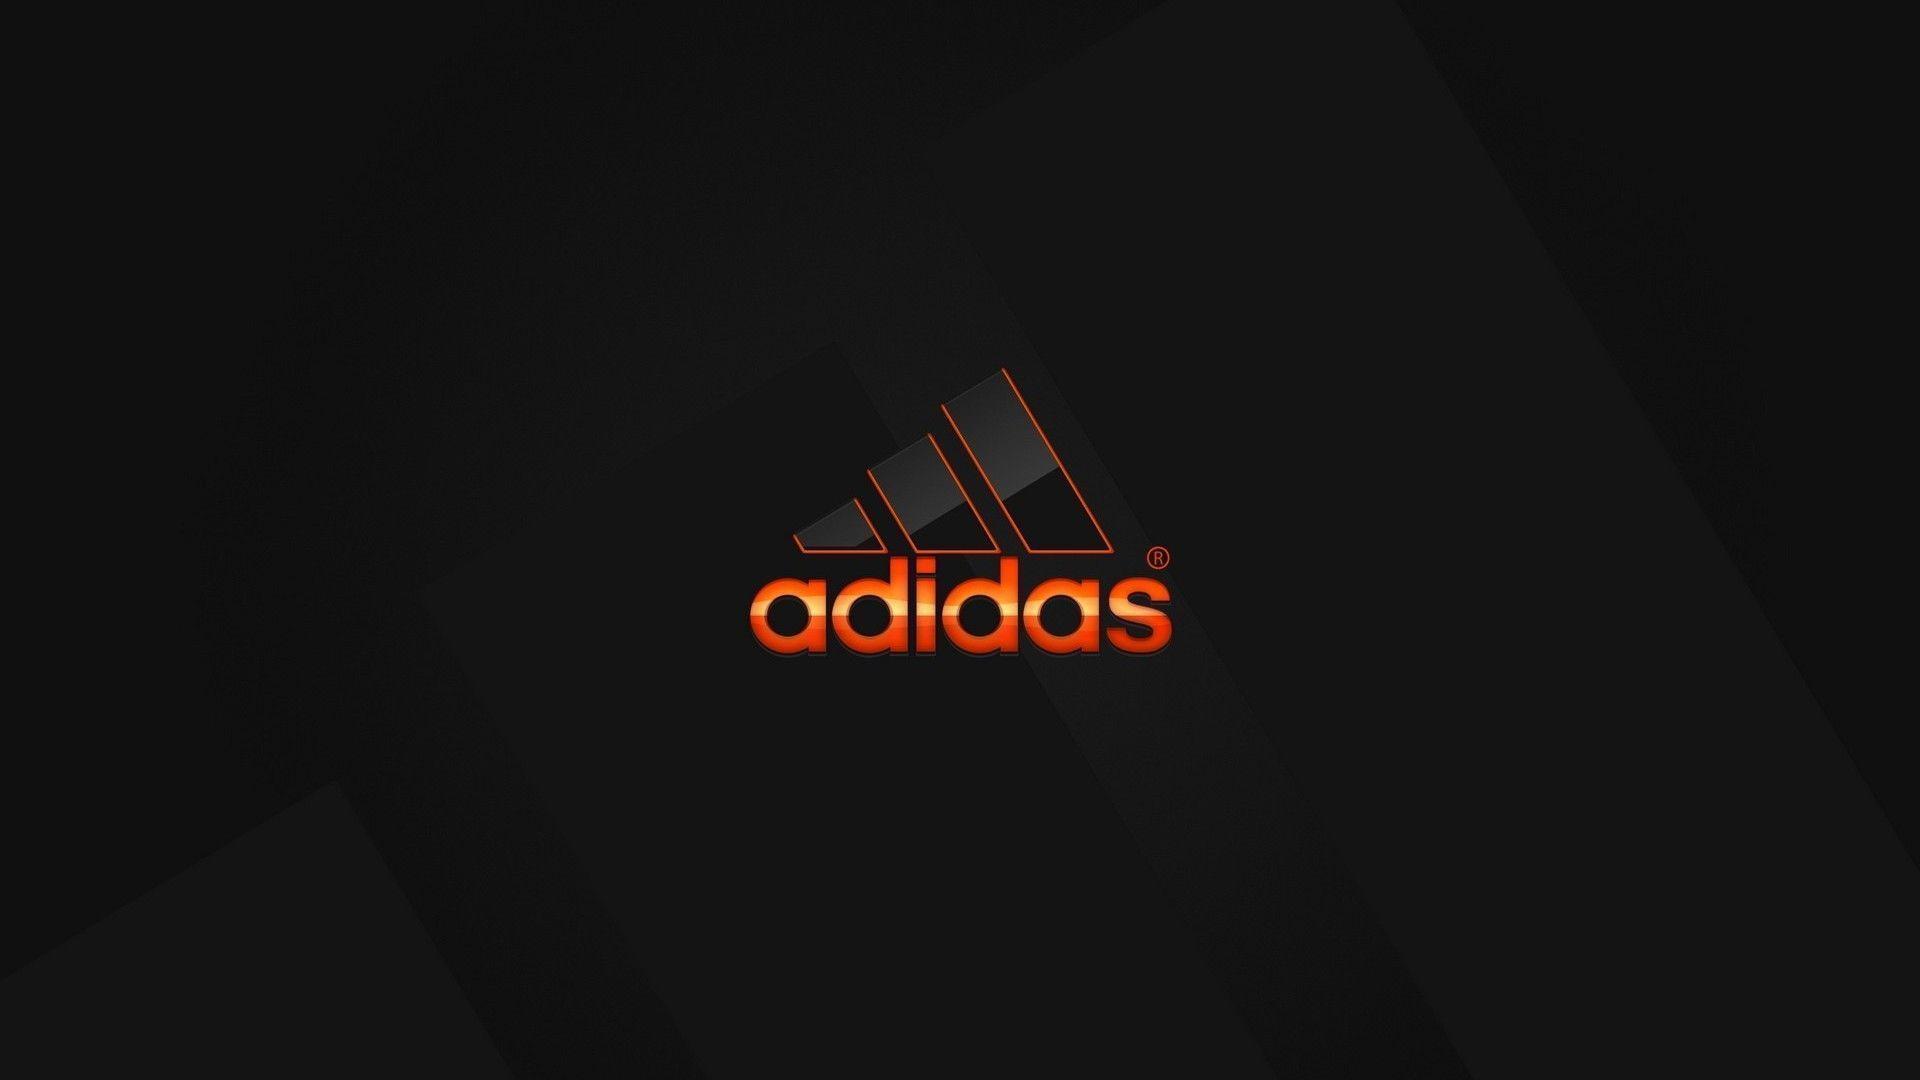 adidas logo wallpapers 2015 wallpaper cave